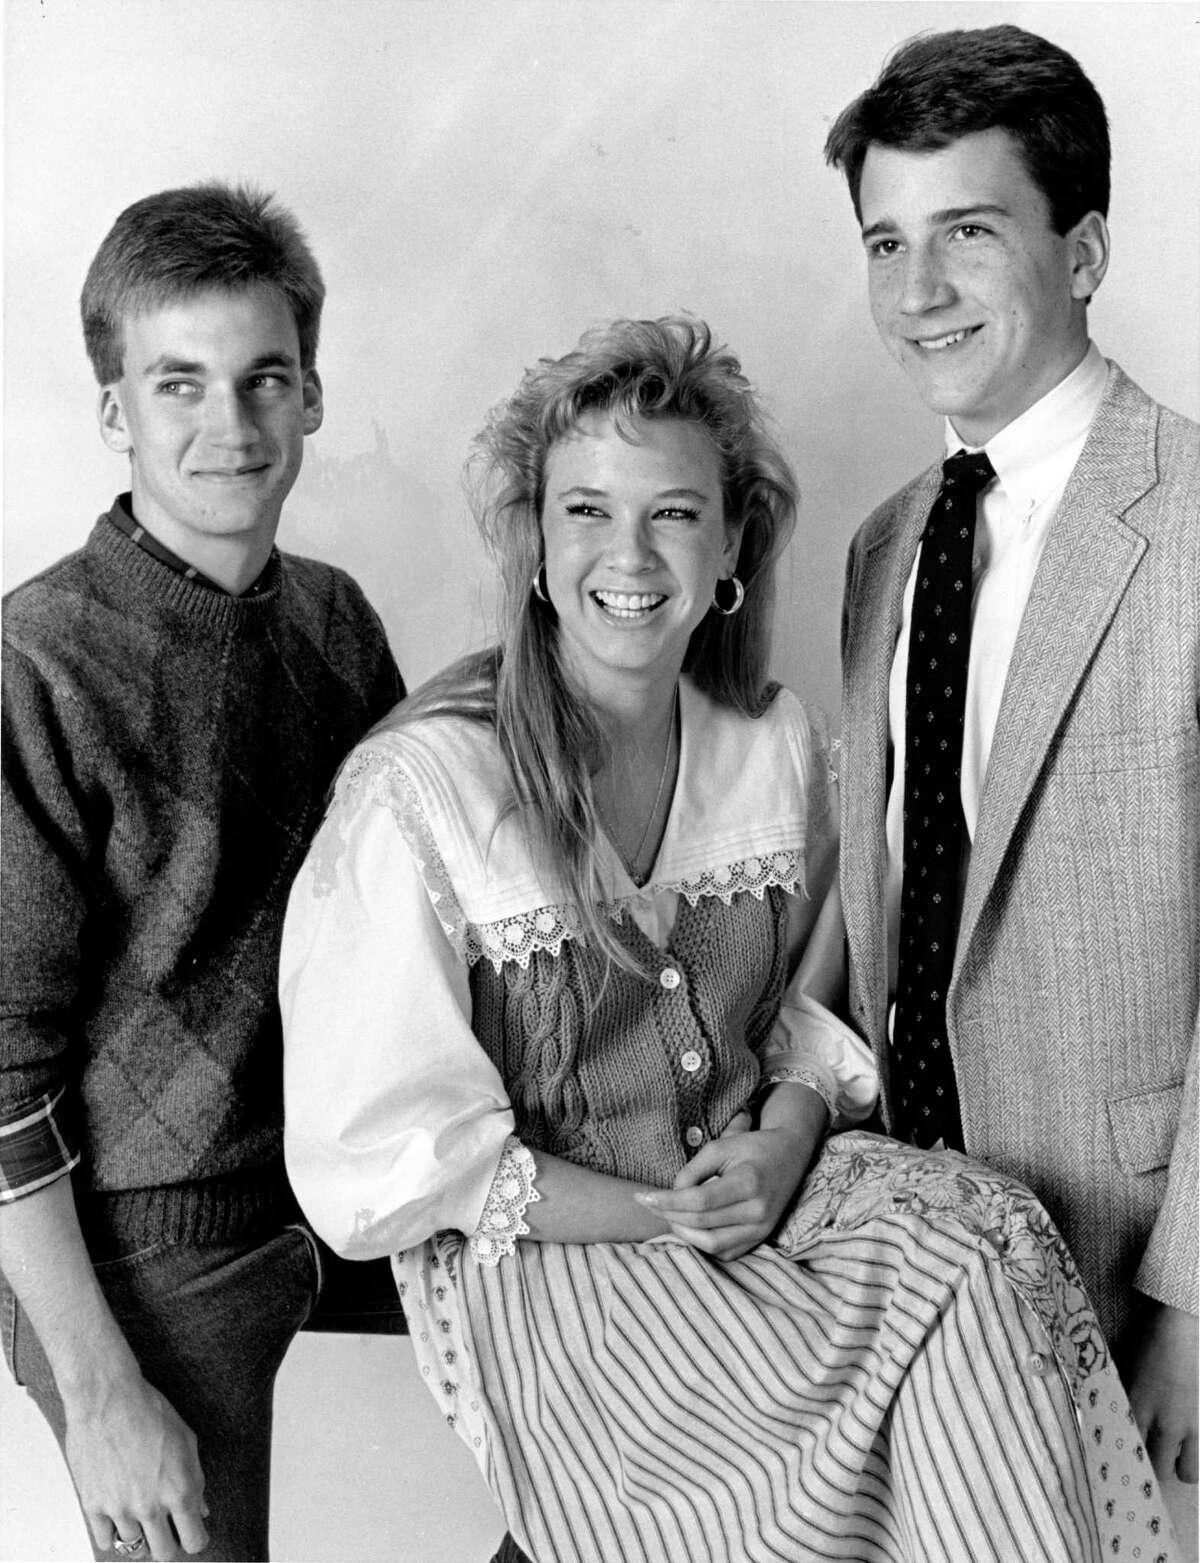 Houston Post High School Natural Science Essay Contest winners Paul Poirot, left, Renée Zellweger, and Mark Beeley, January 1987.